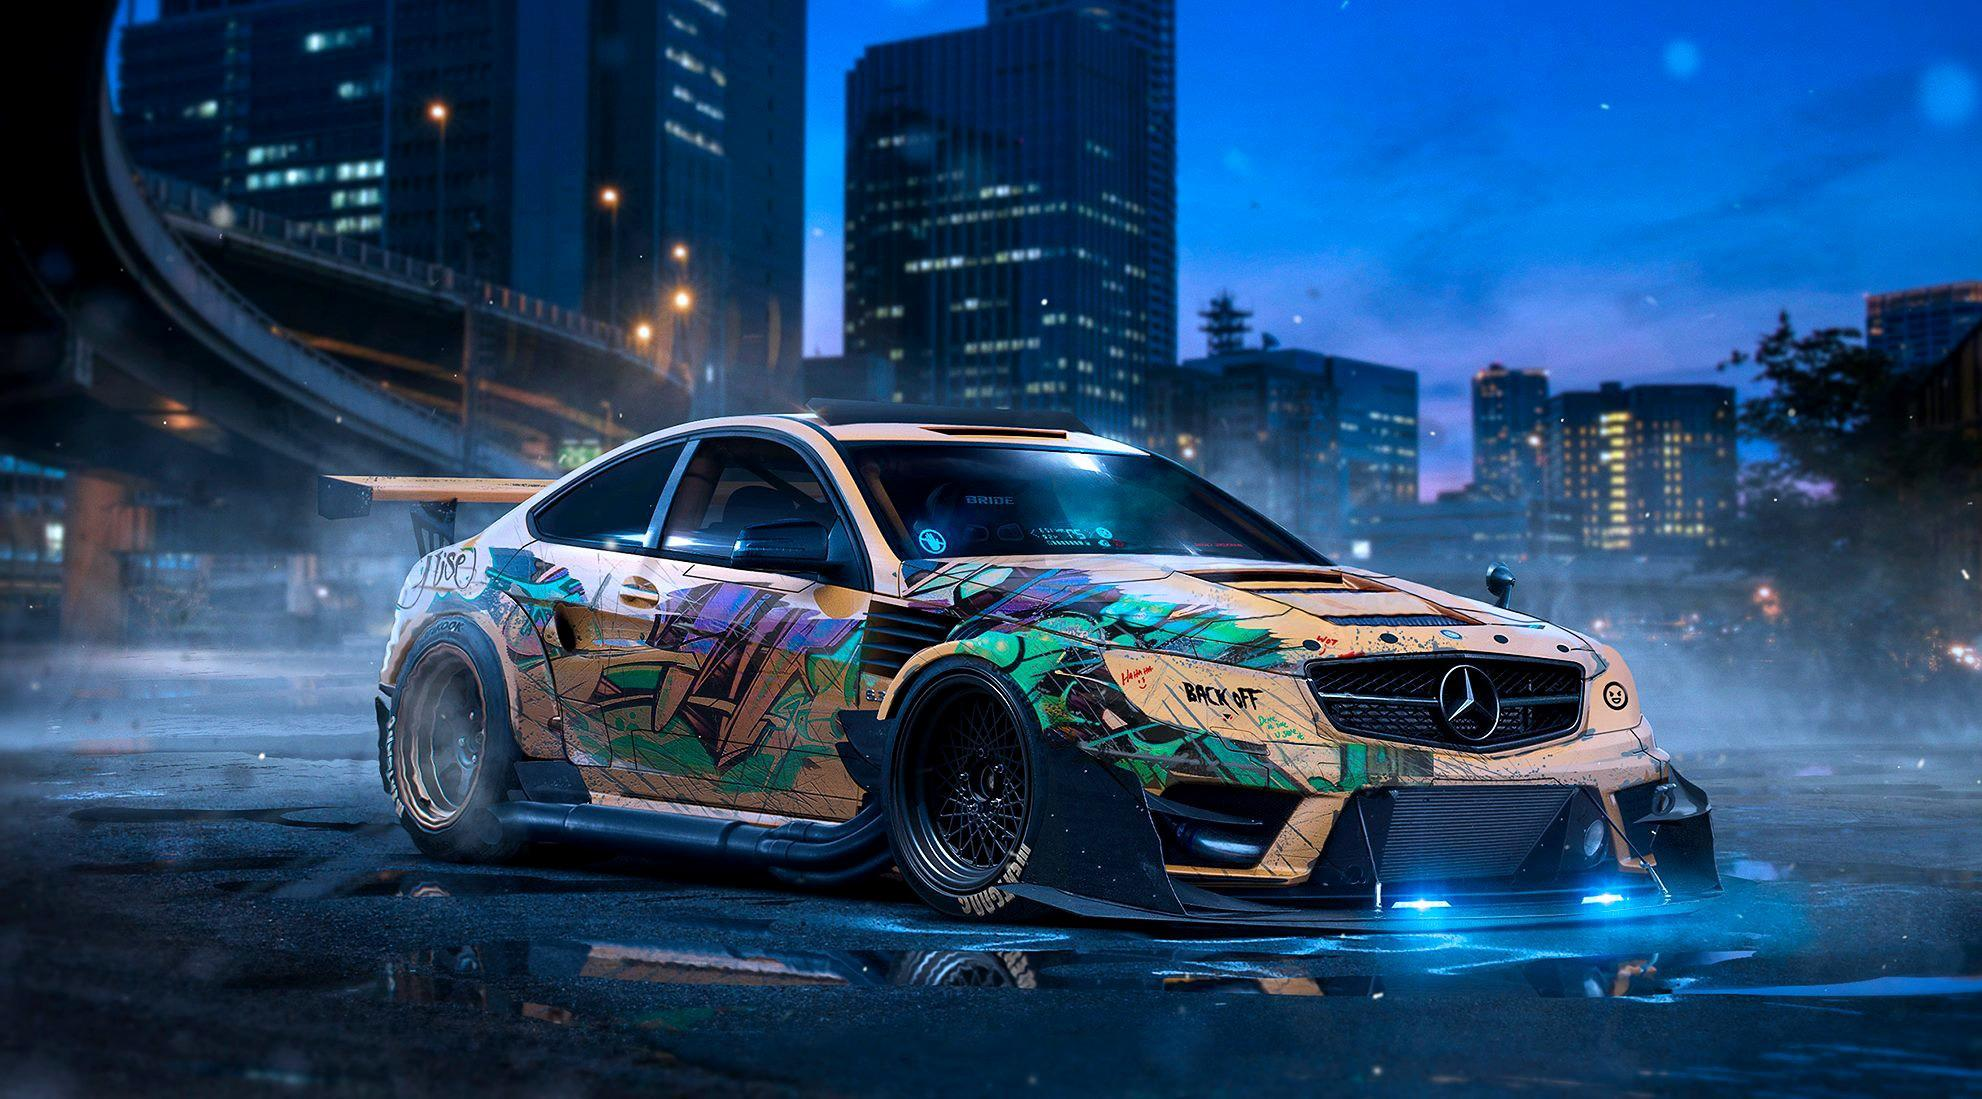 BMW M4 Drifting Tuned Desktop Wallpapers - Wallpaper Cave